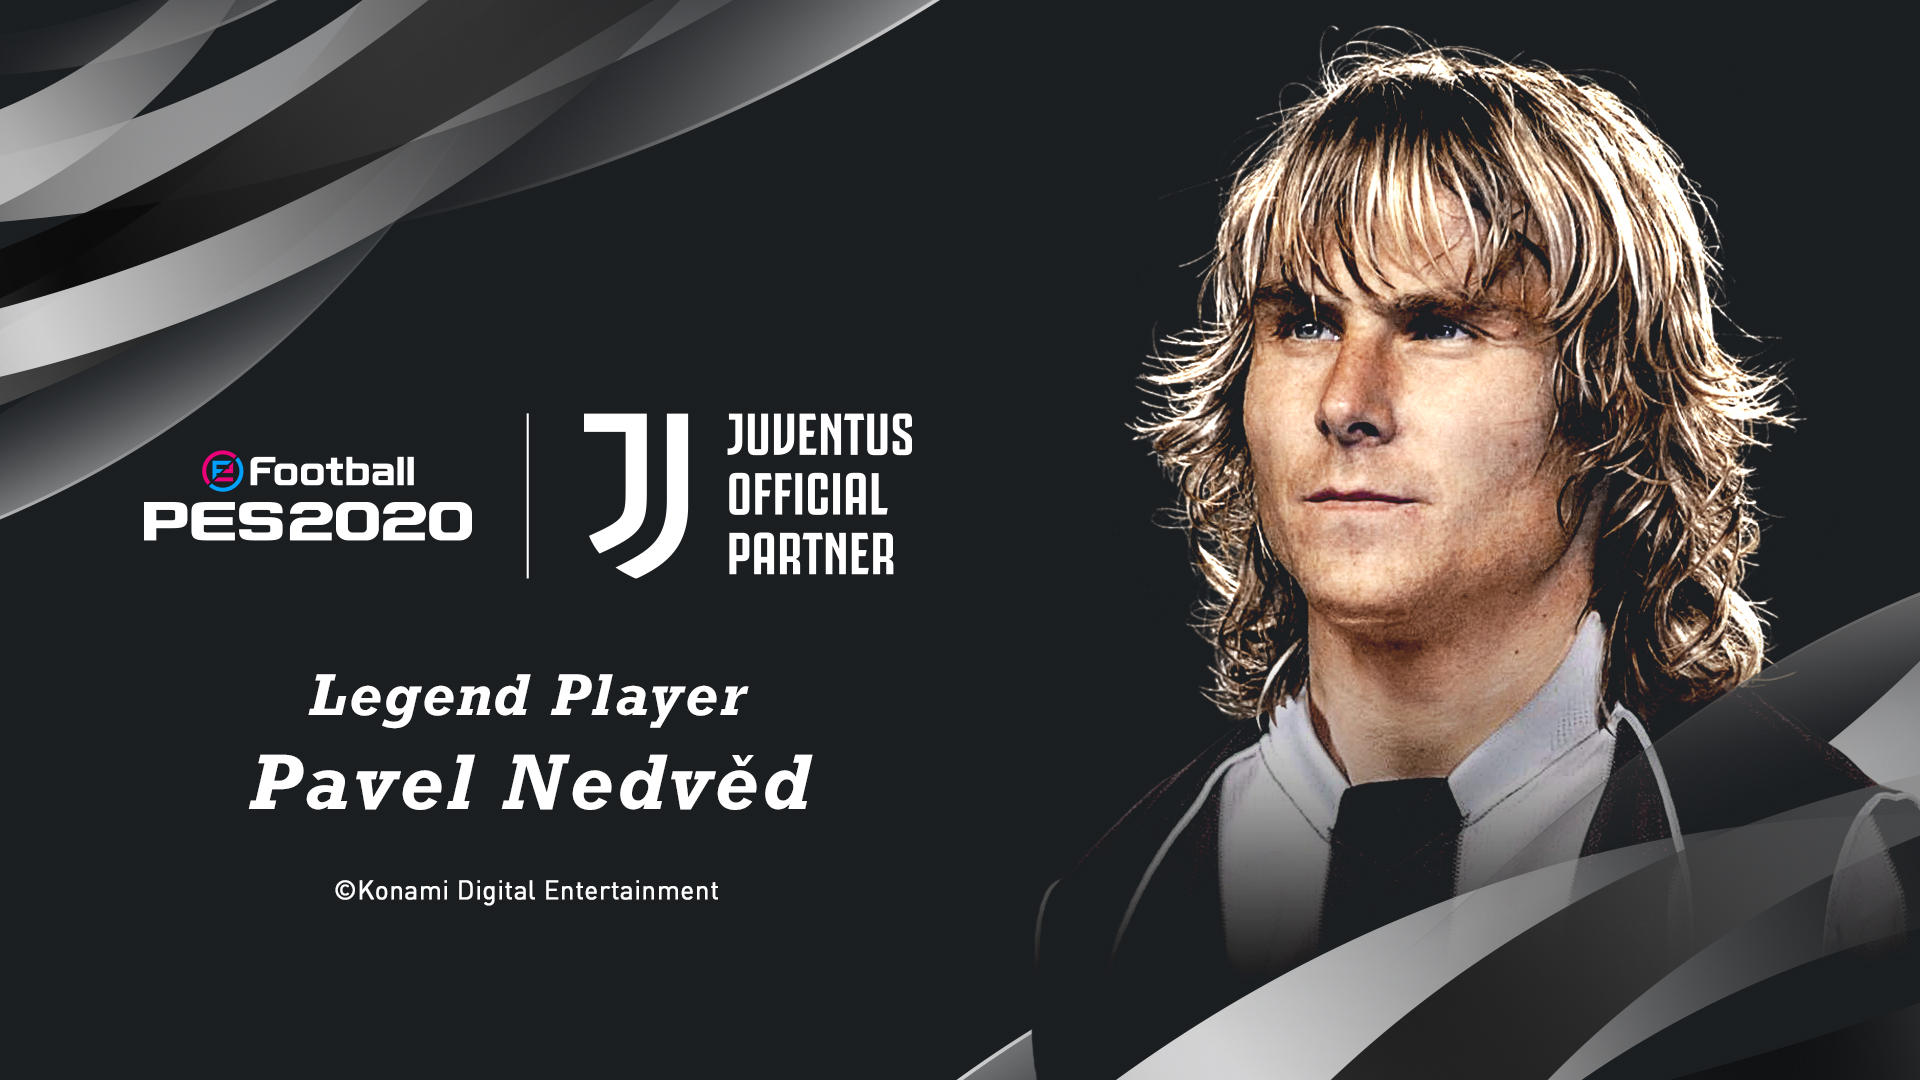 eFootball PES 2020 X Juventus - Le immagini